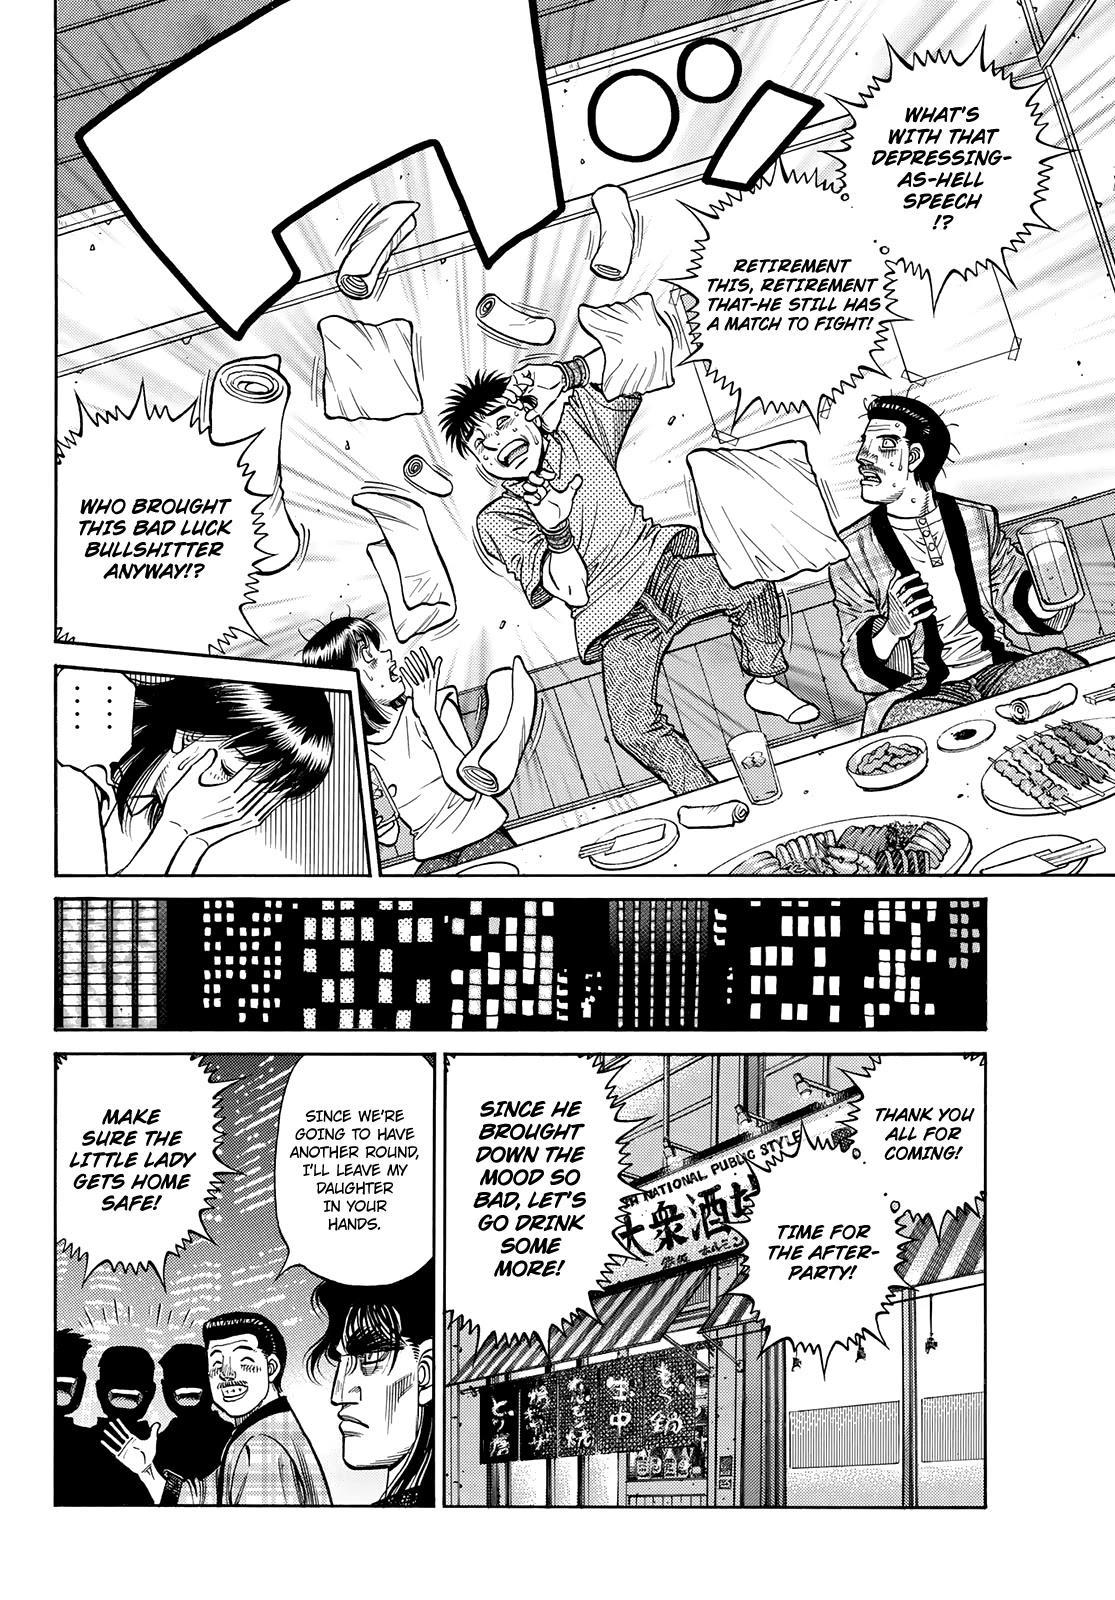 Hajime No Ippo Chapter 1352: Encouragement Party page 10 - Mangakakalot